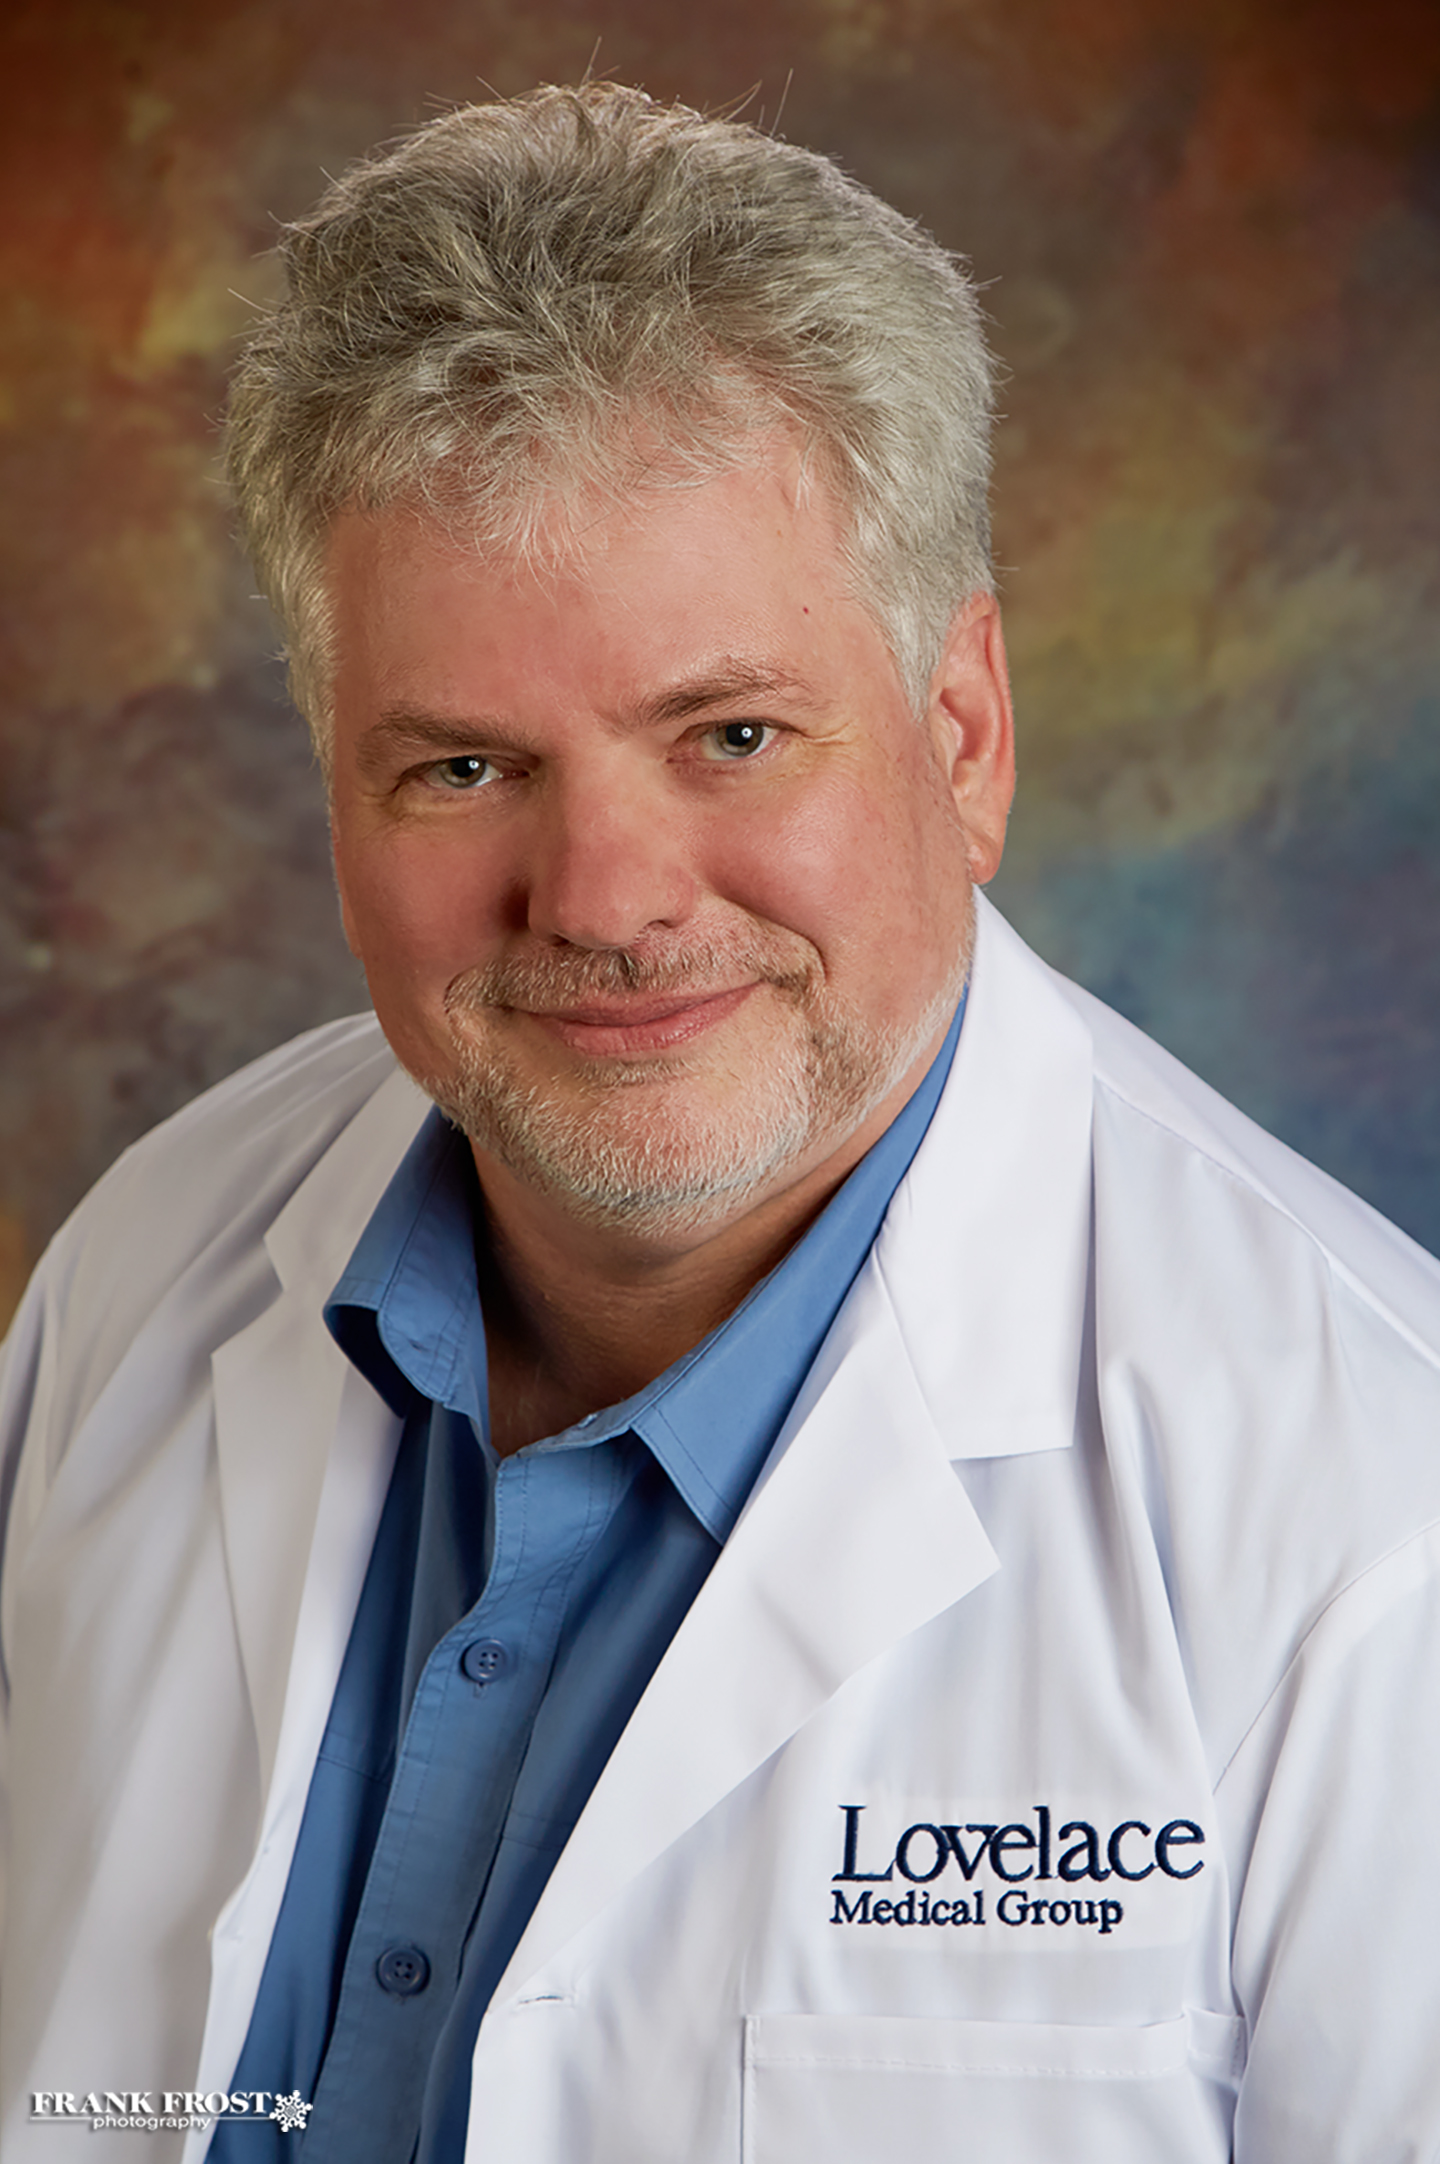 Kevin Rosenberg, M.D.